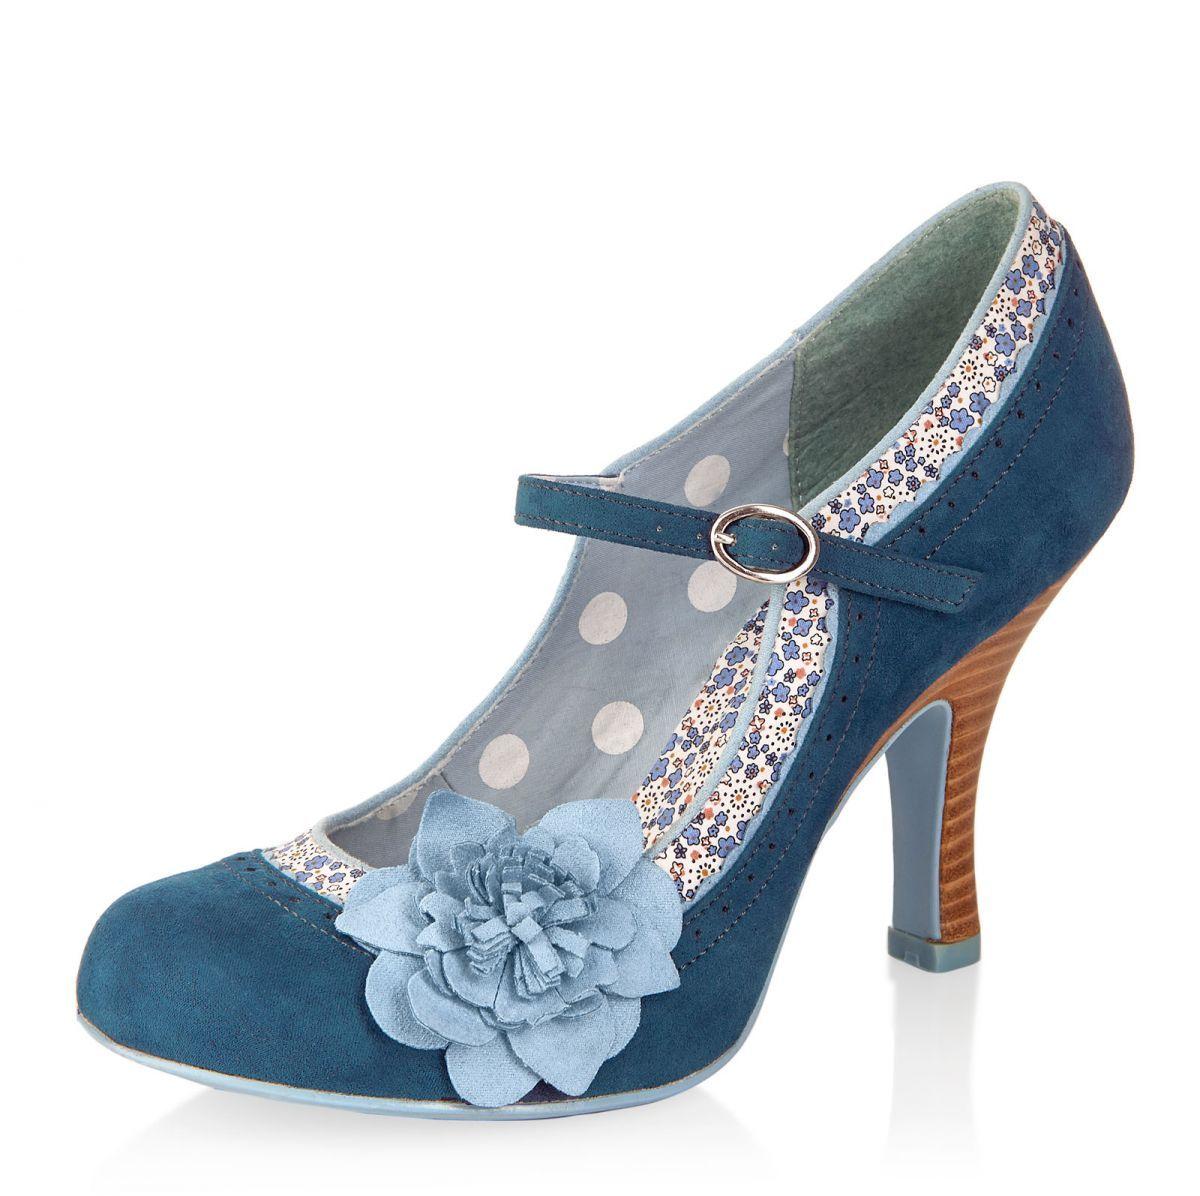 fddcd898964 Ruby Shoo Poppy Blue Floral Mary Jane High Heel Flower Shoes